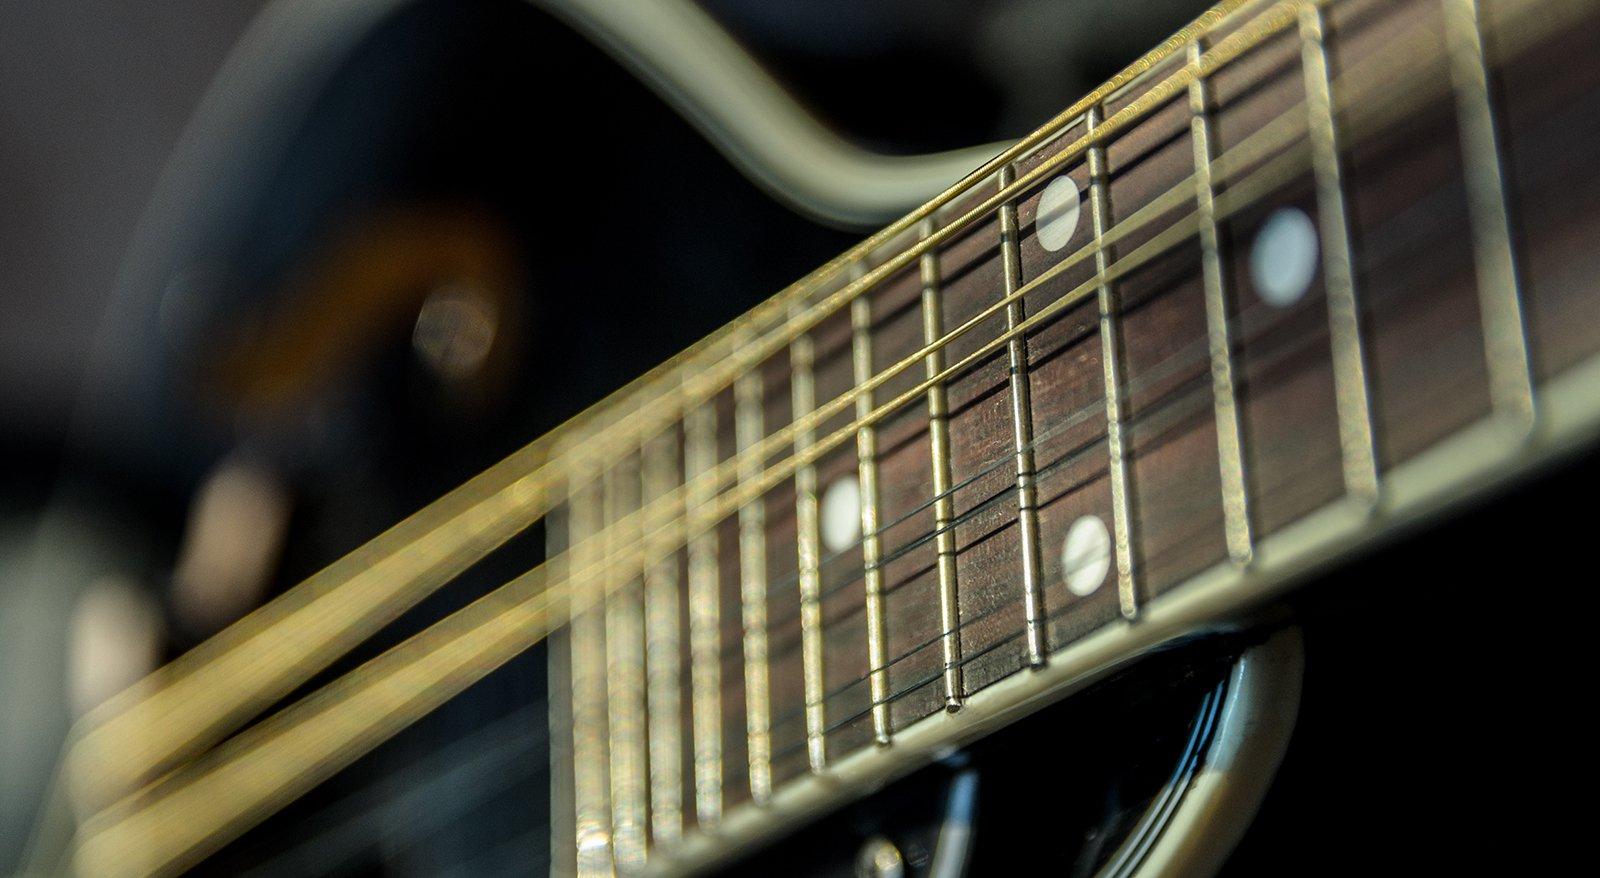 QCM-D analogy guitar